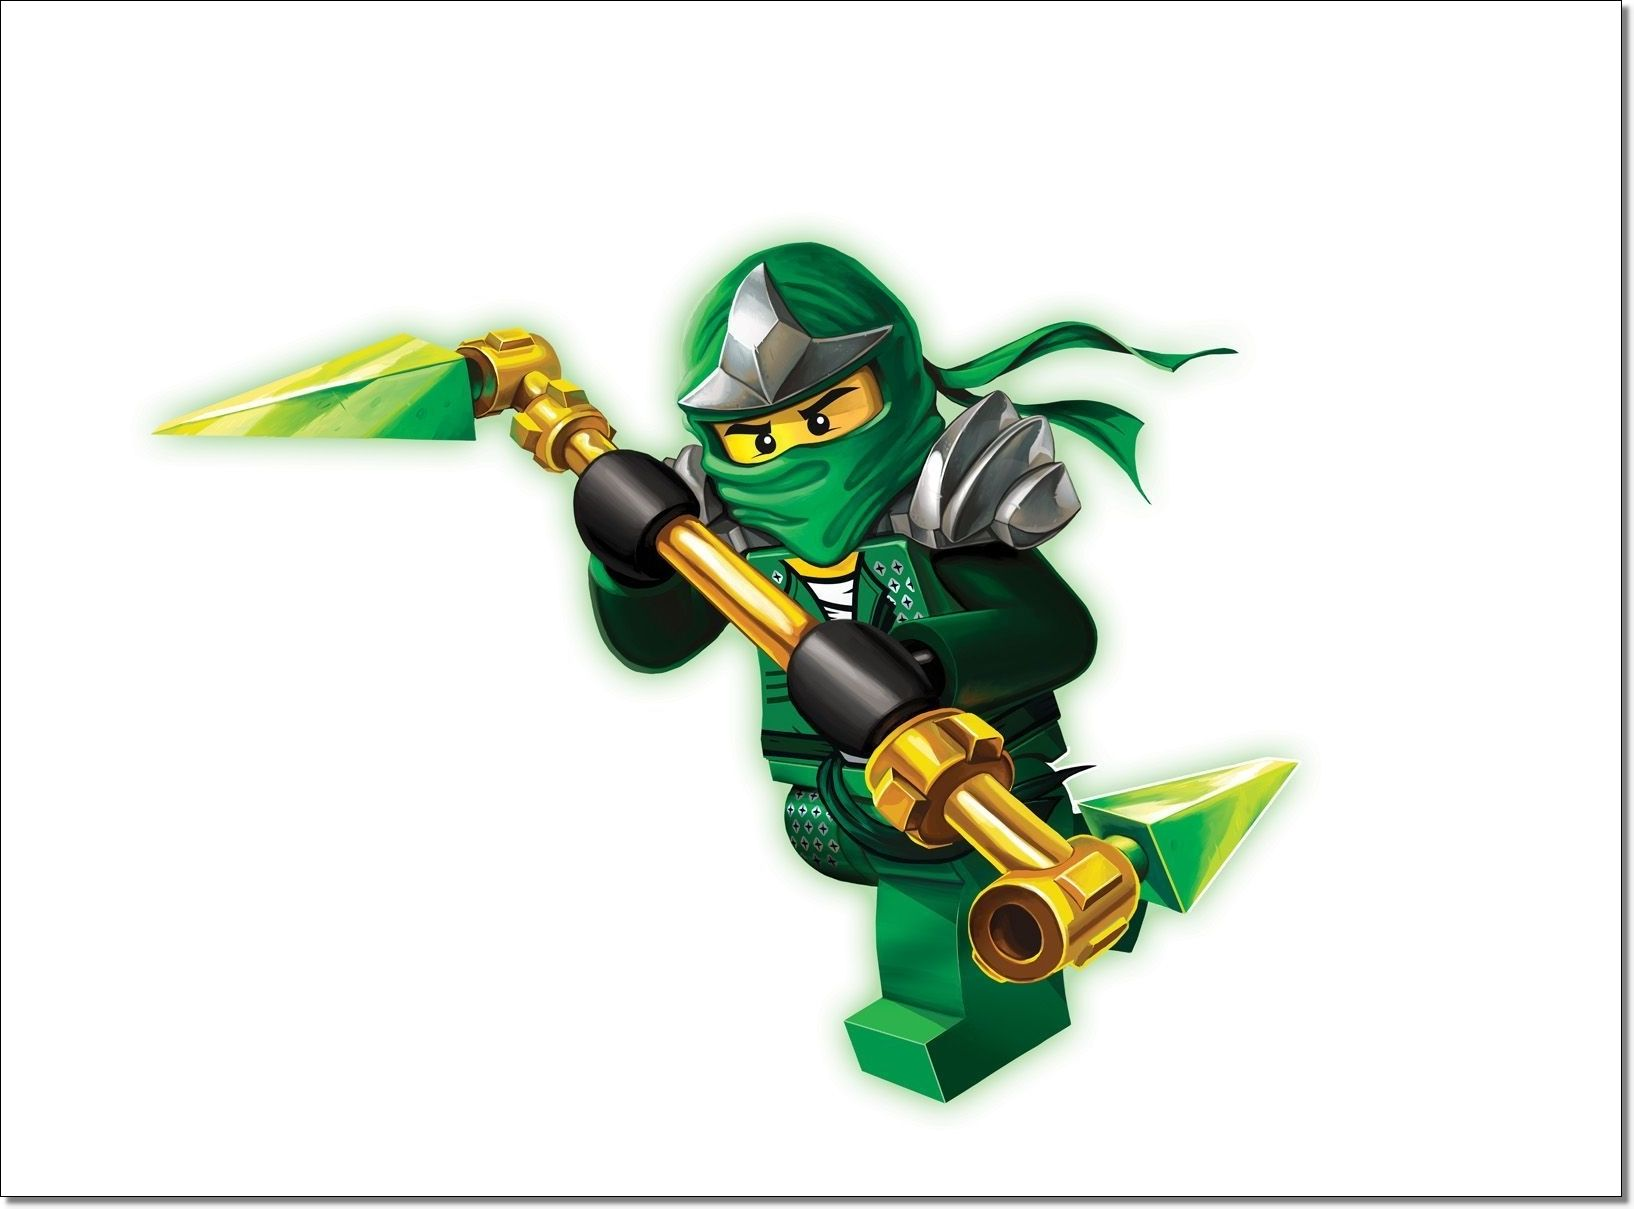 ninjago wallpapers download articulo mercadolibre mlv lego ninjago wallpaper 1634x1209